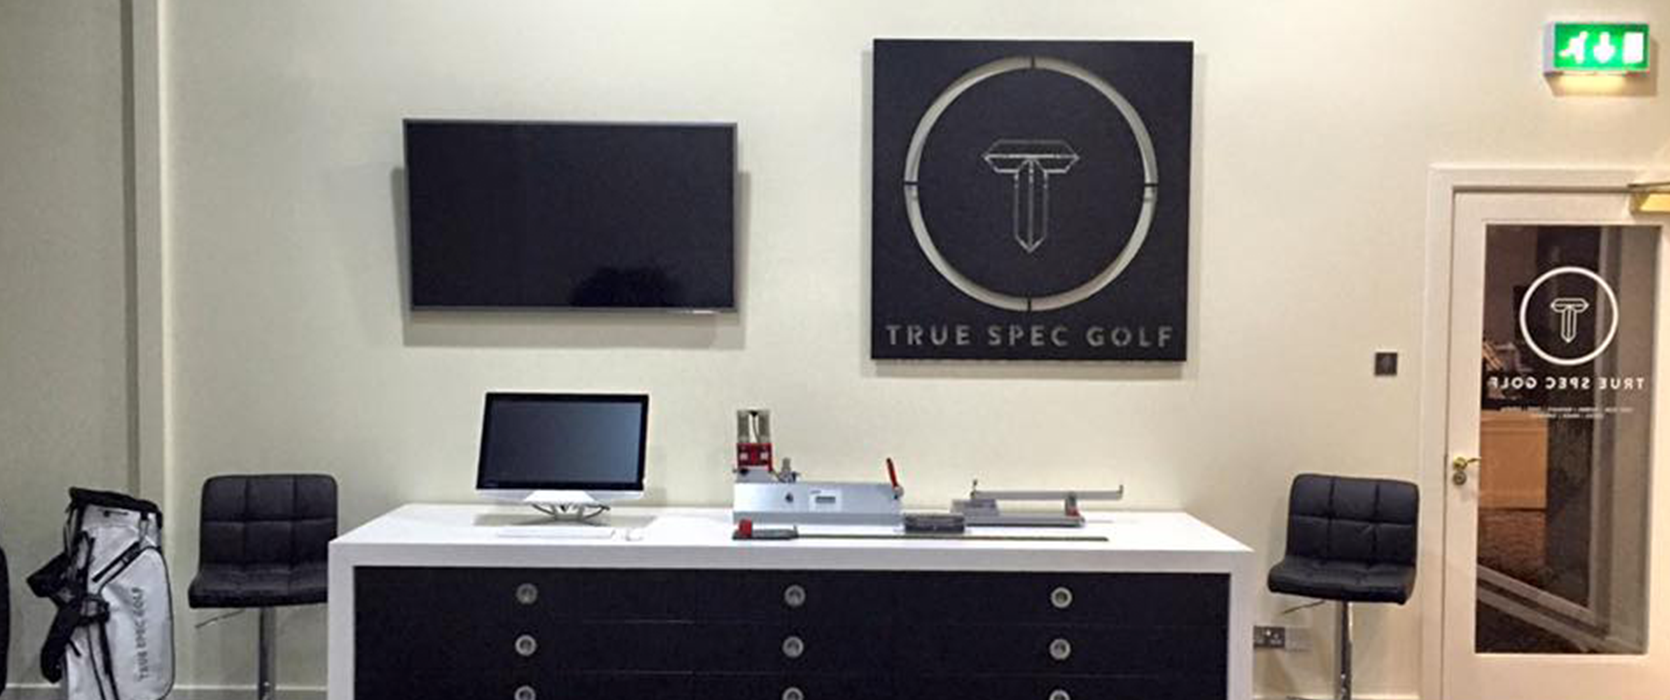 owen-kerr-true-spec-golf-case-study-banner-1